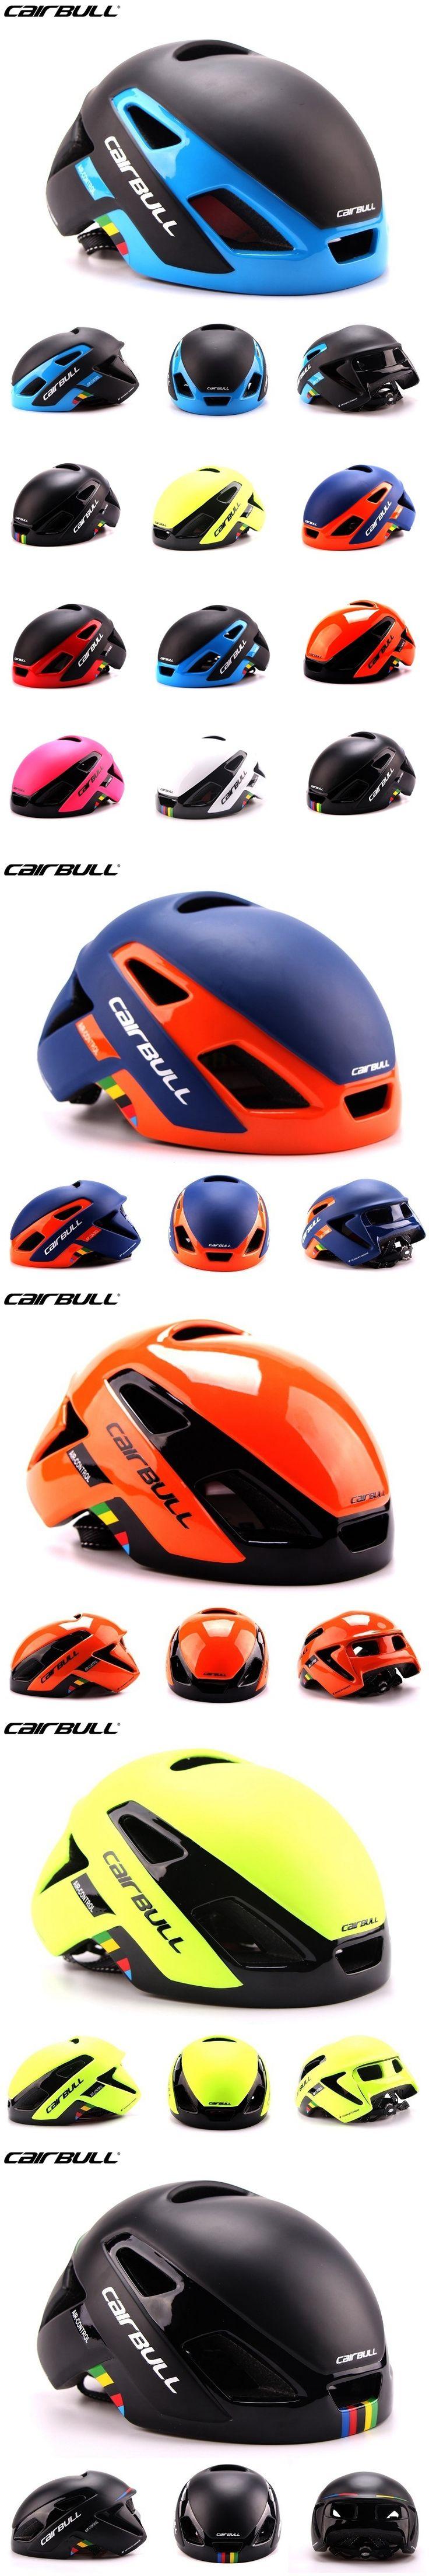 CAIRBULL Helmet Cycling Bike Helmet cascos ciclismo mtb Integrally molded Safety Sport Helmet for Men Women